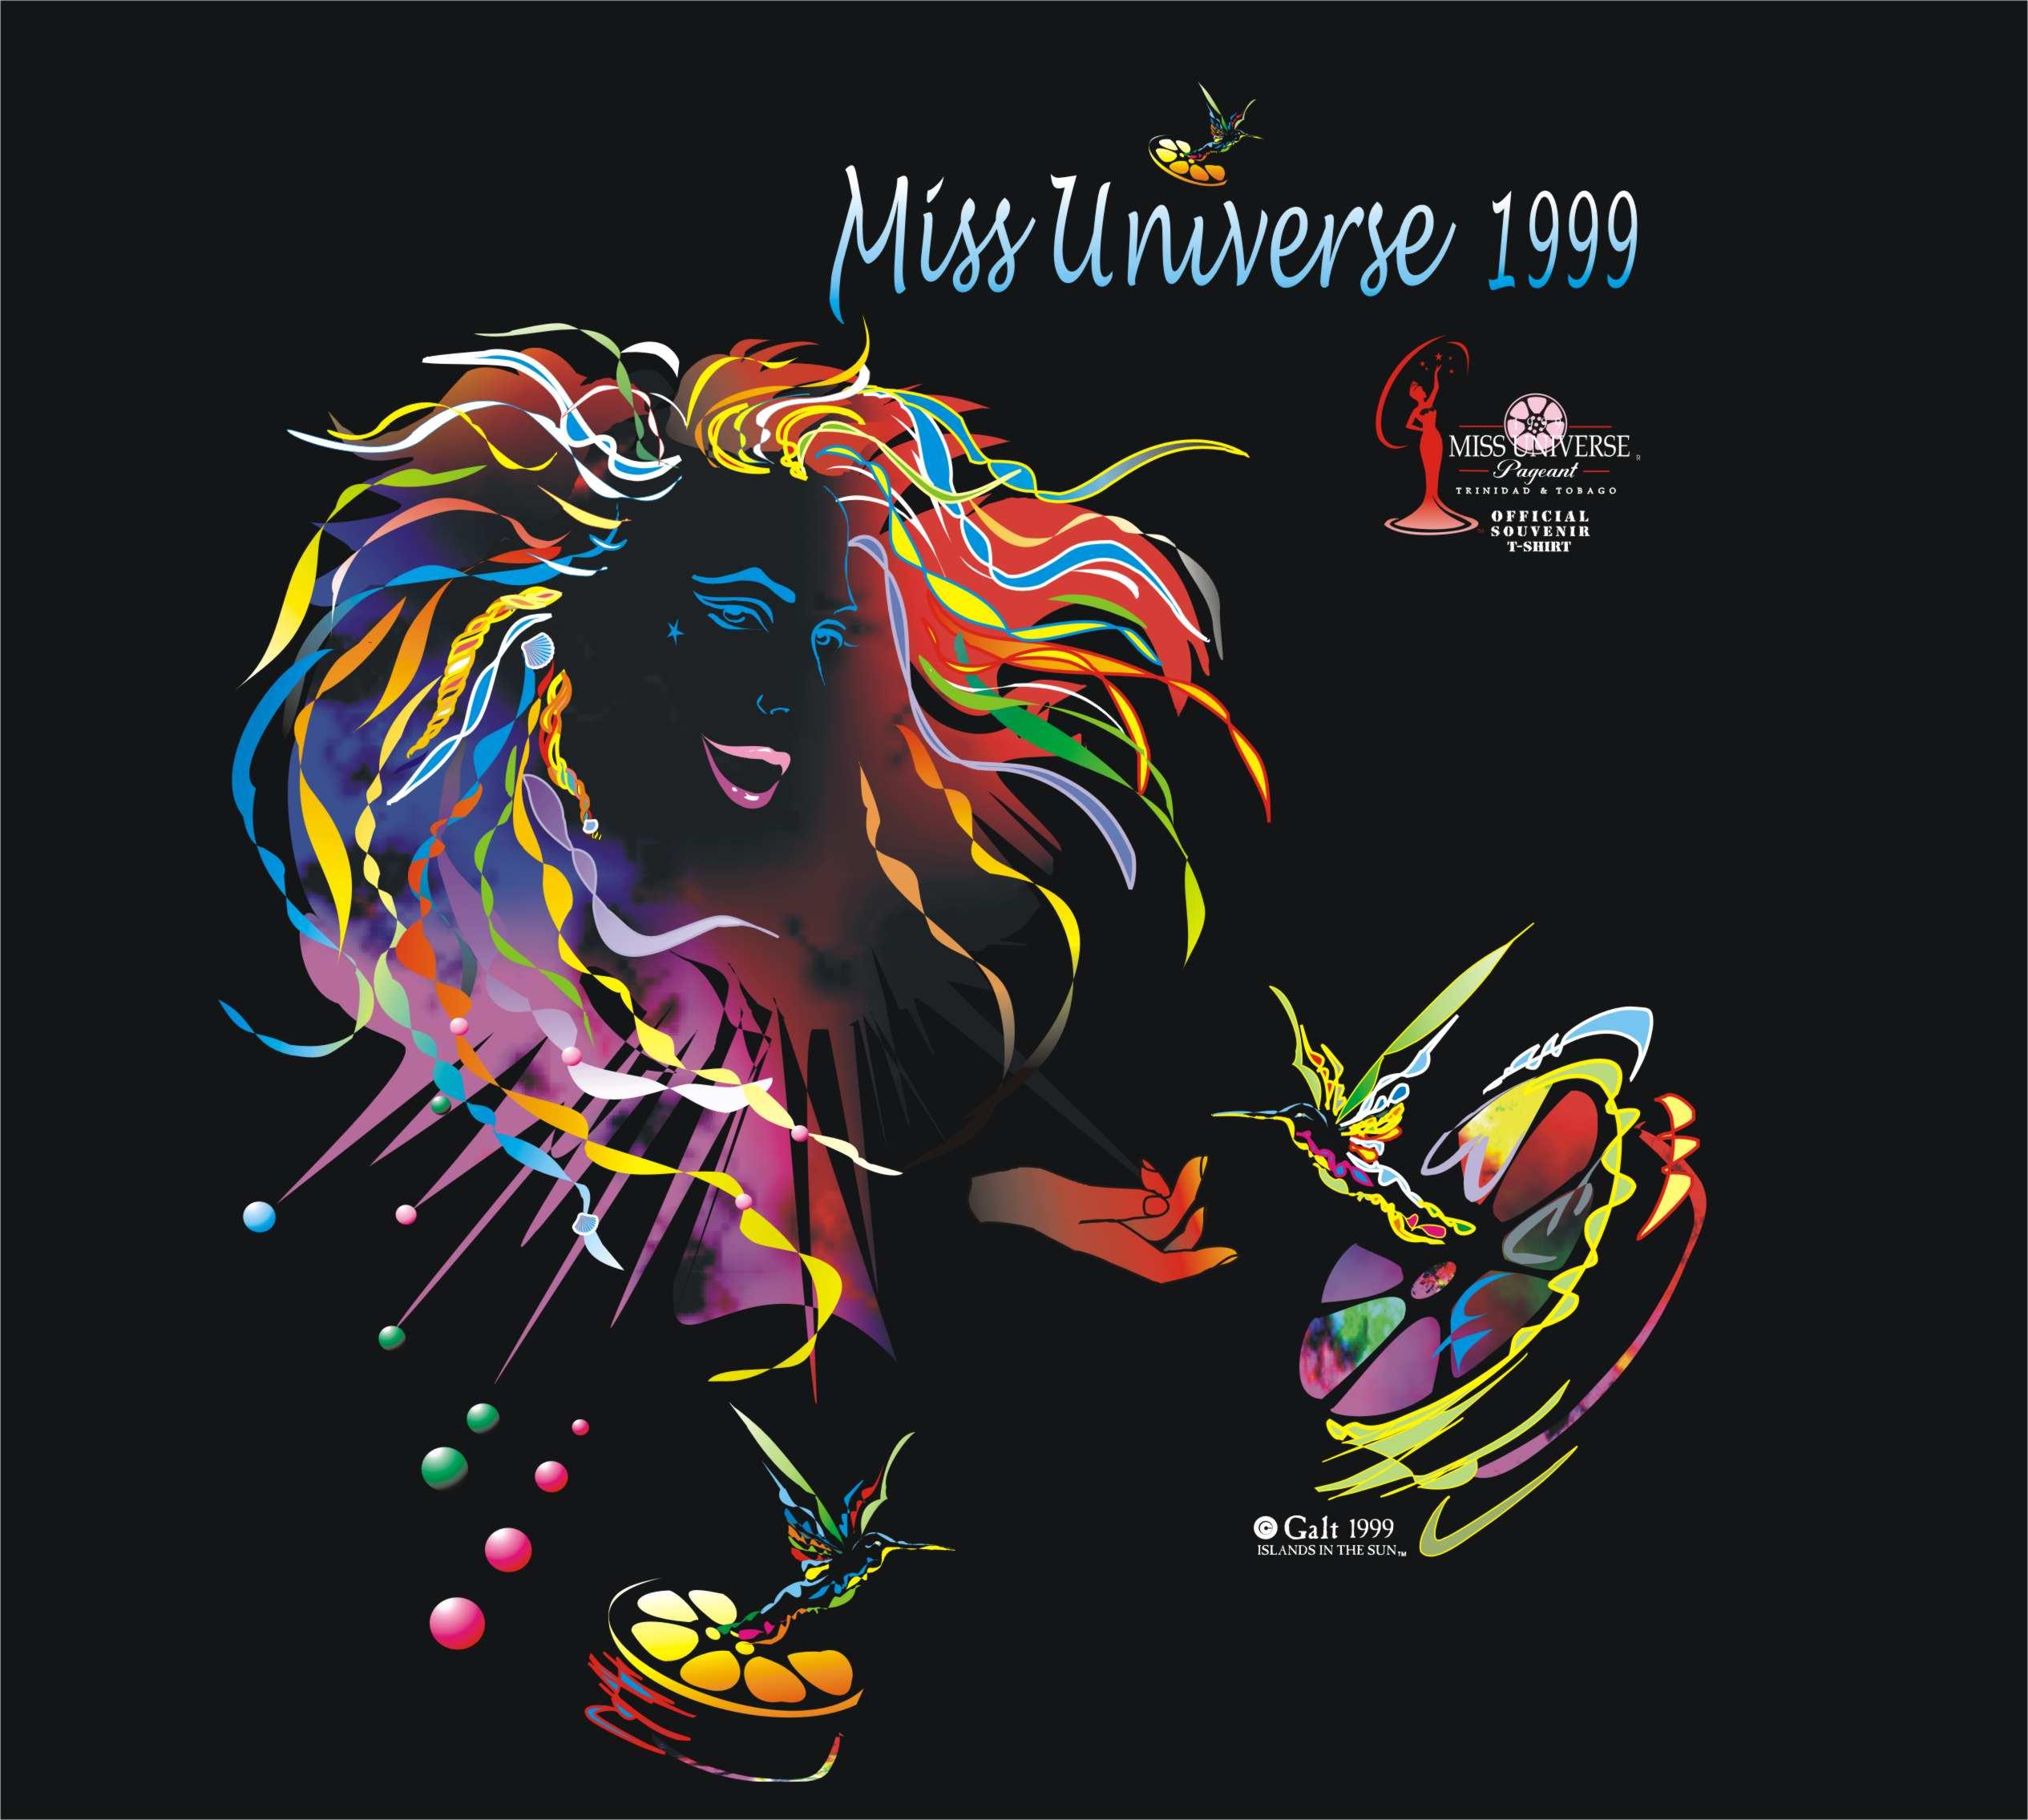 Miss universe tee 1999